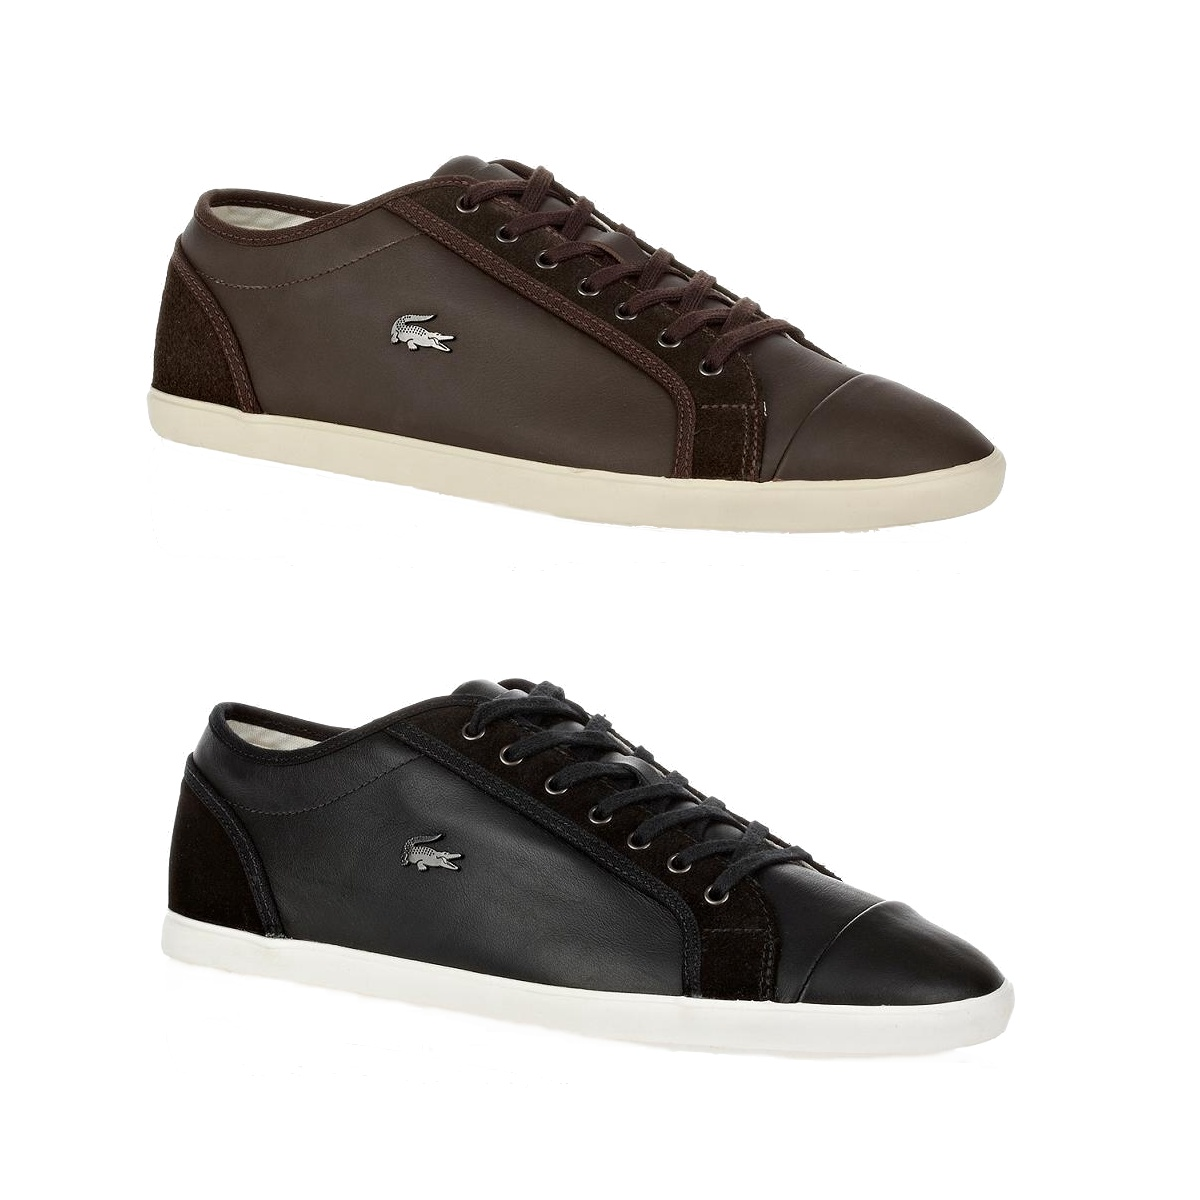 lacoste berber 9 schuhe sneaker herren leder schwarz und. Black Bedroom Furniture Sets. Home Design Ideas